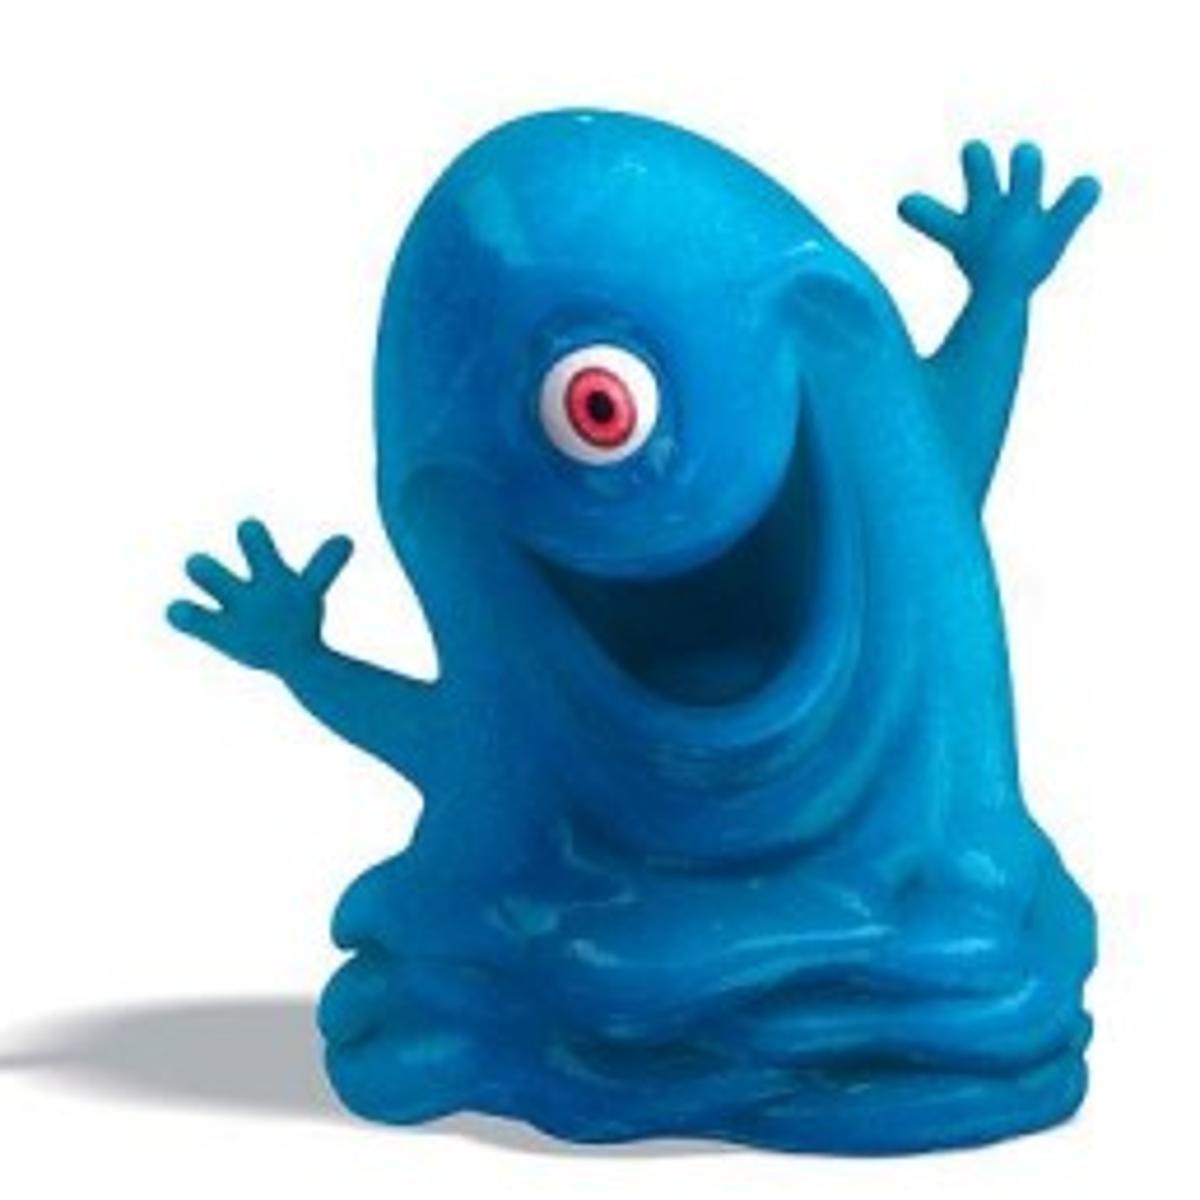 Monsters Vs Aliens Has High Energy Humor Movies Nwitimes Com